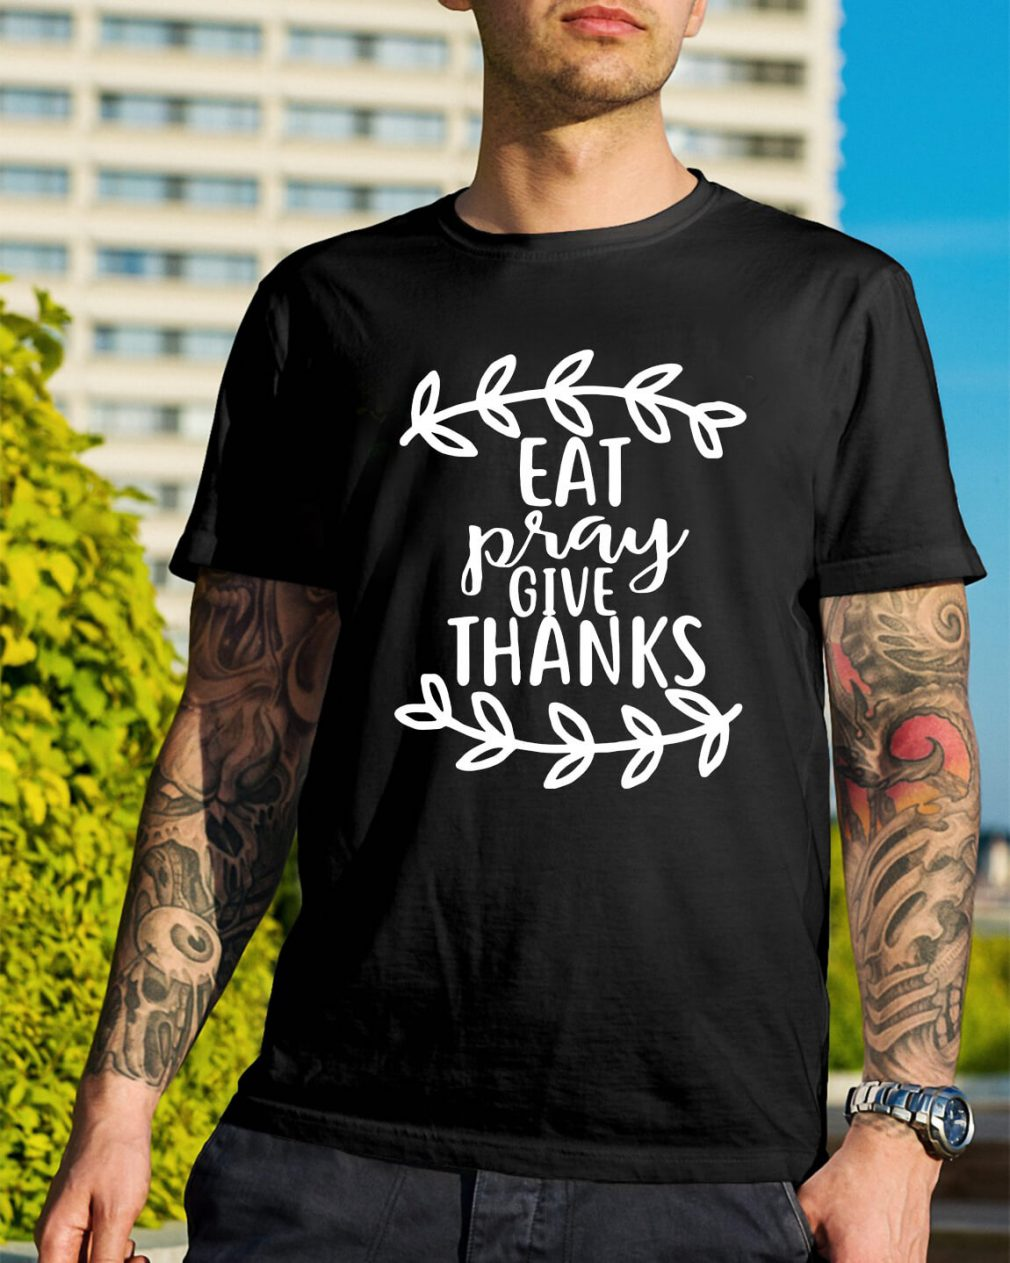 Eat pray give thanks shirt